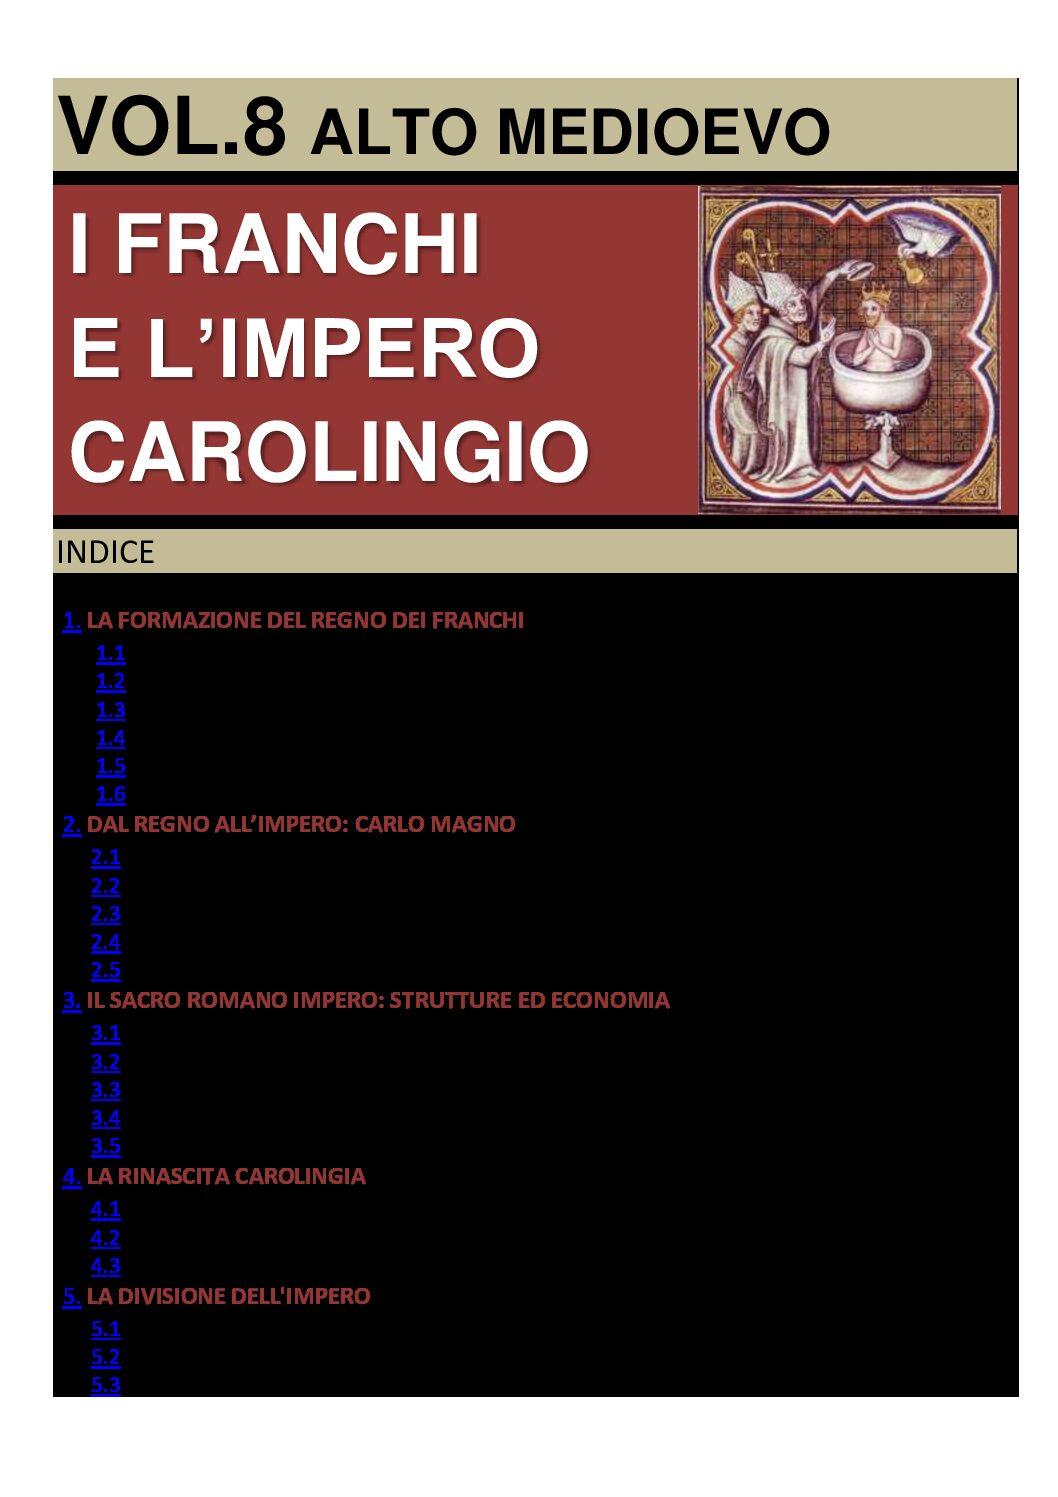 I FRANCHI E L'IMPERO CAROLINGIO